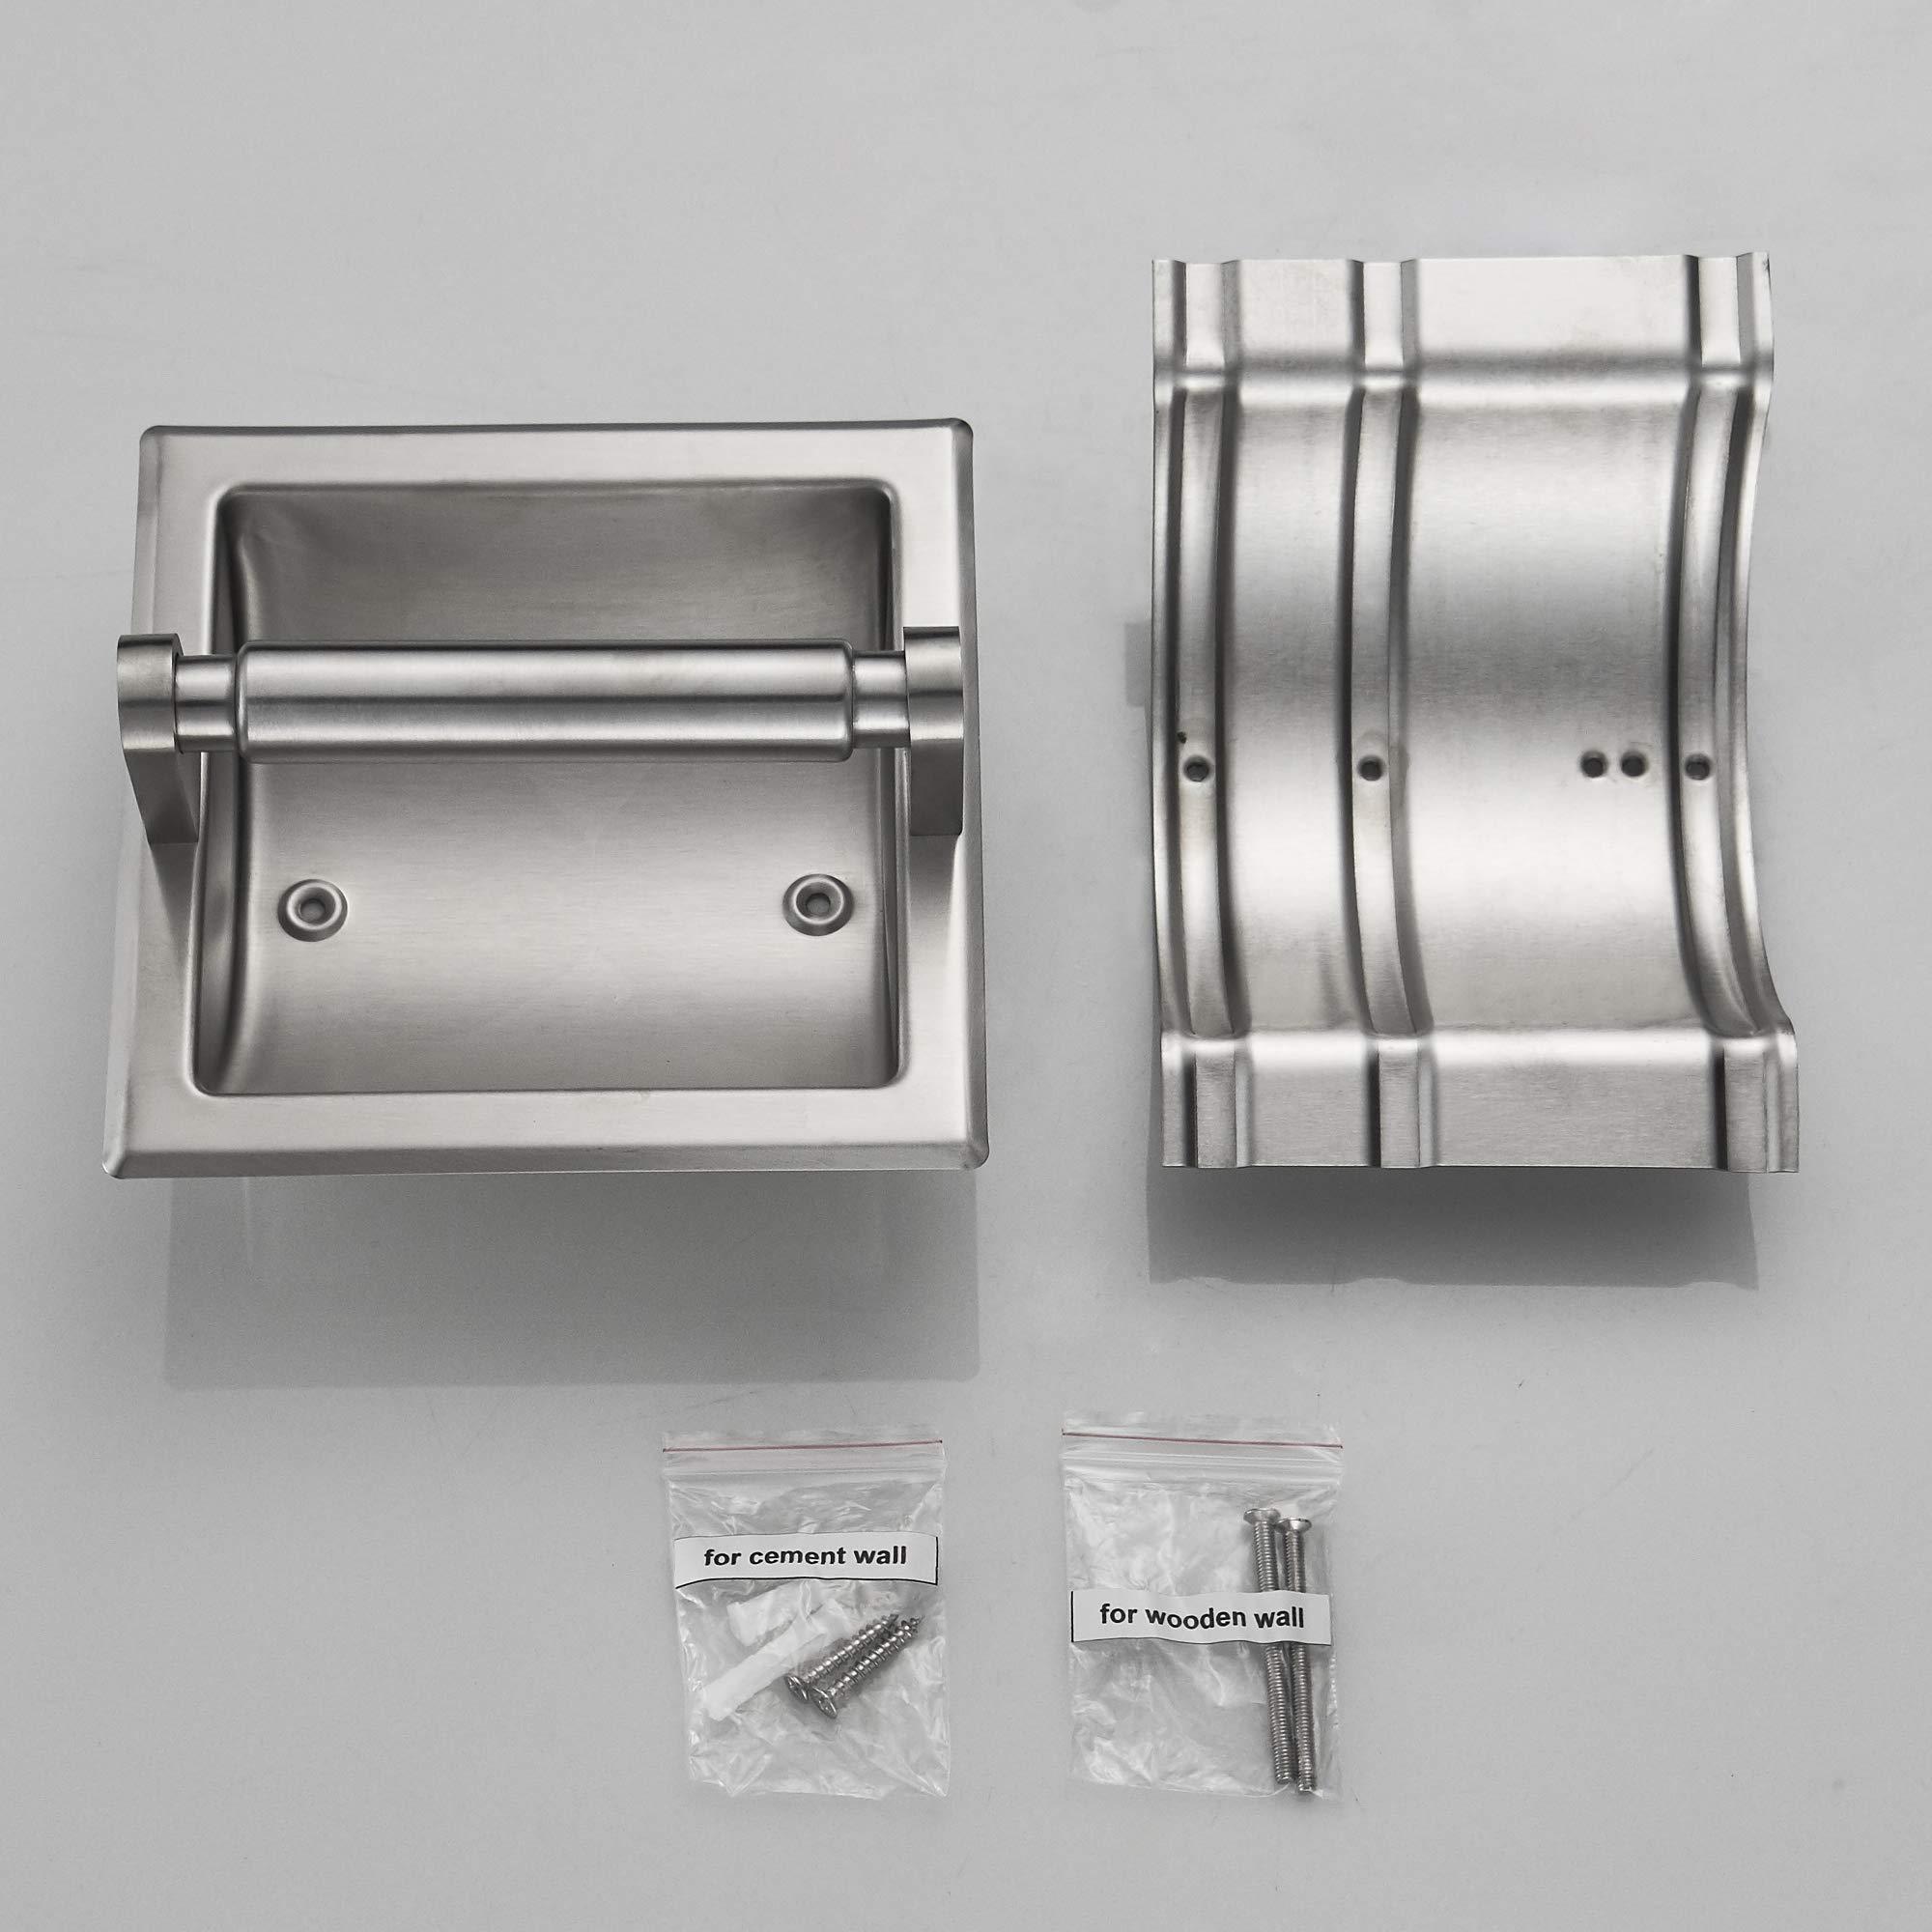 JunSun Brushed Nickel Recessed Toilet Paper Holder Wall Toilet Paper Holder Recessed Toilet Tissue Holder Stainless Steel Toilet Paper Holder Rear Mounting Bracket Included by JunSun (Image #7)